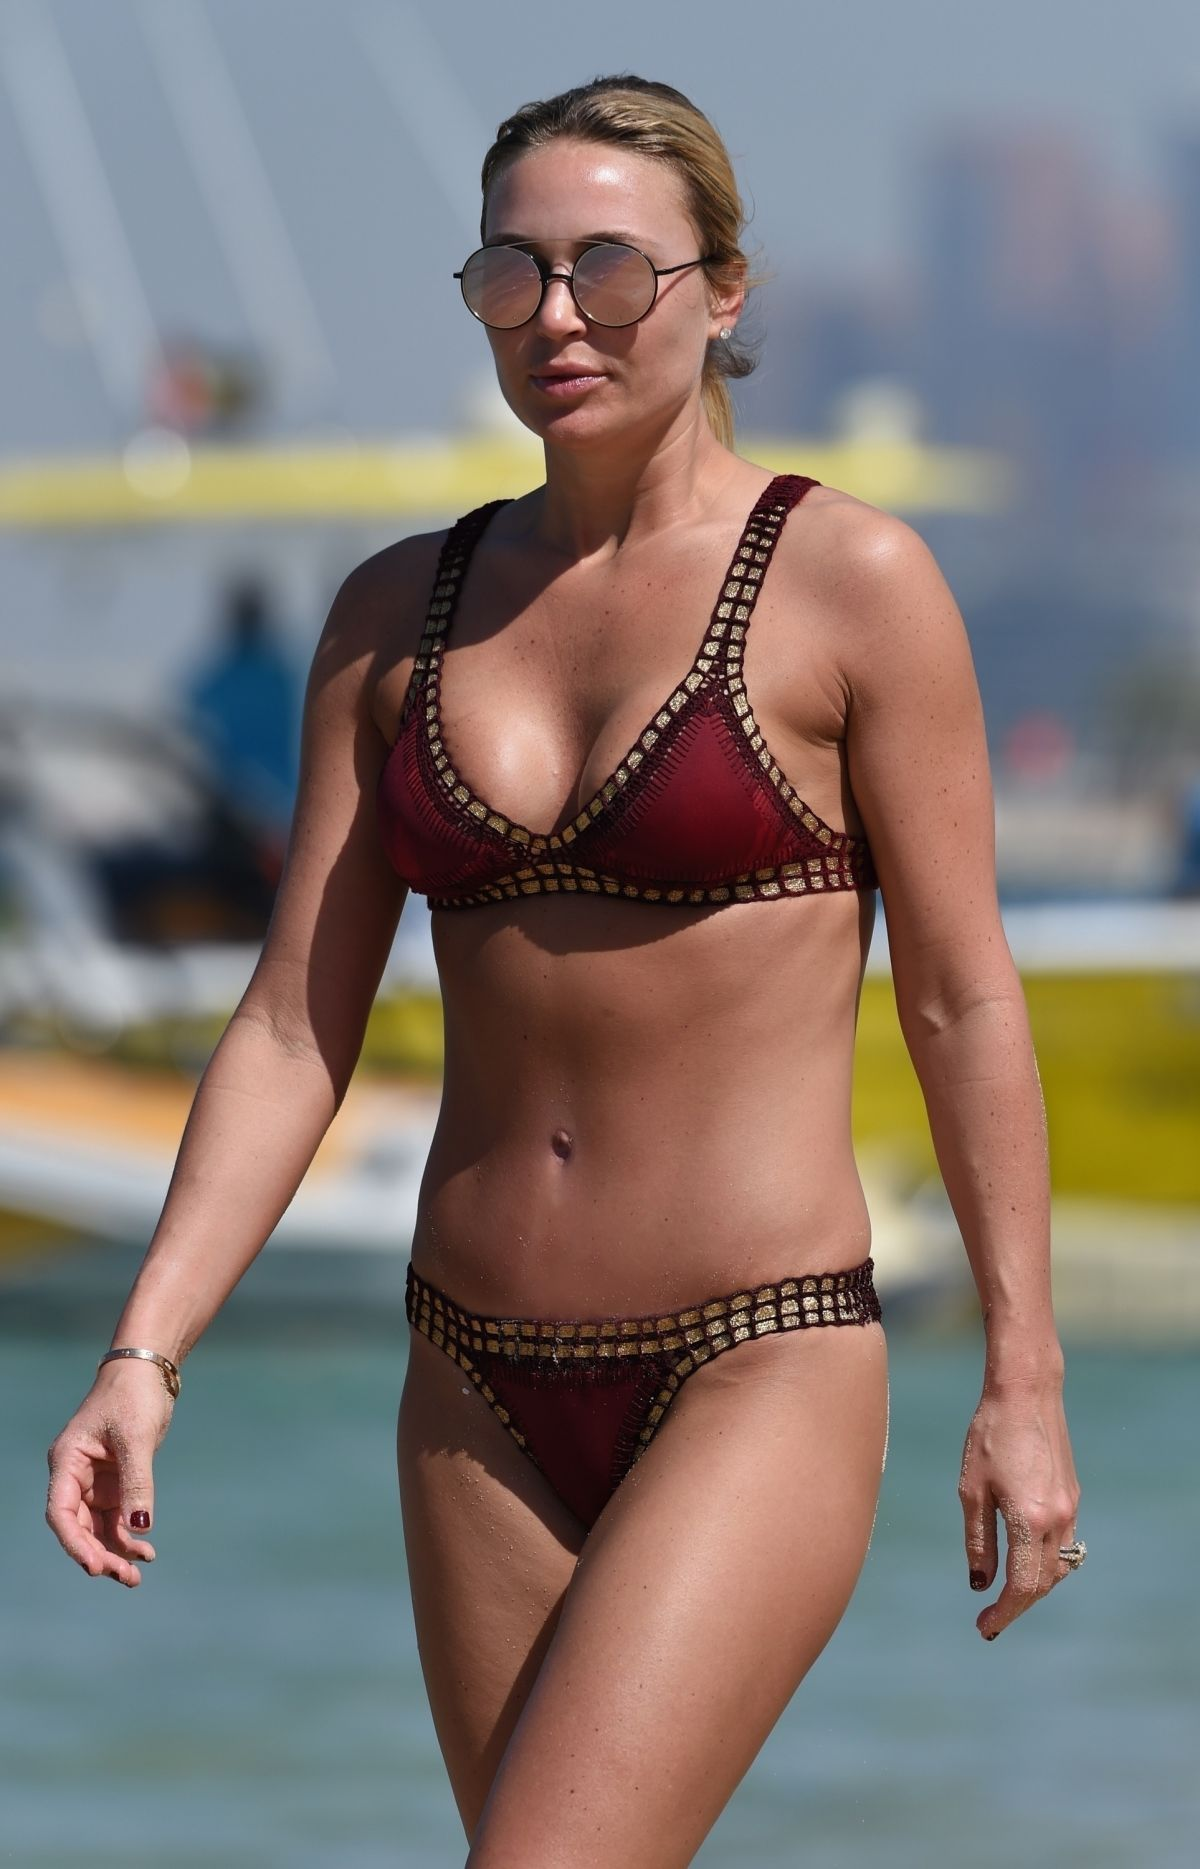 Alex curran bikini